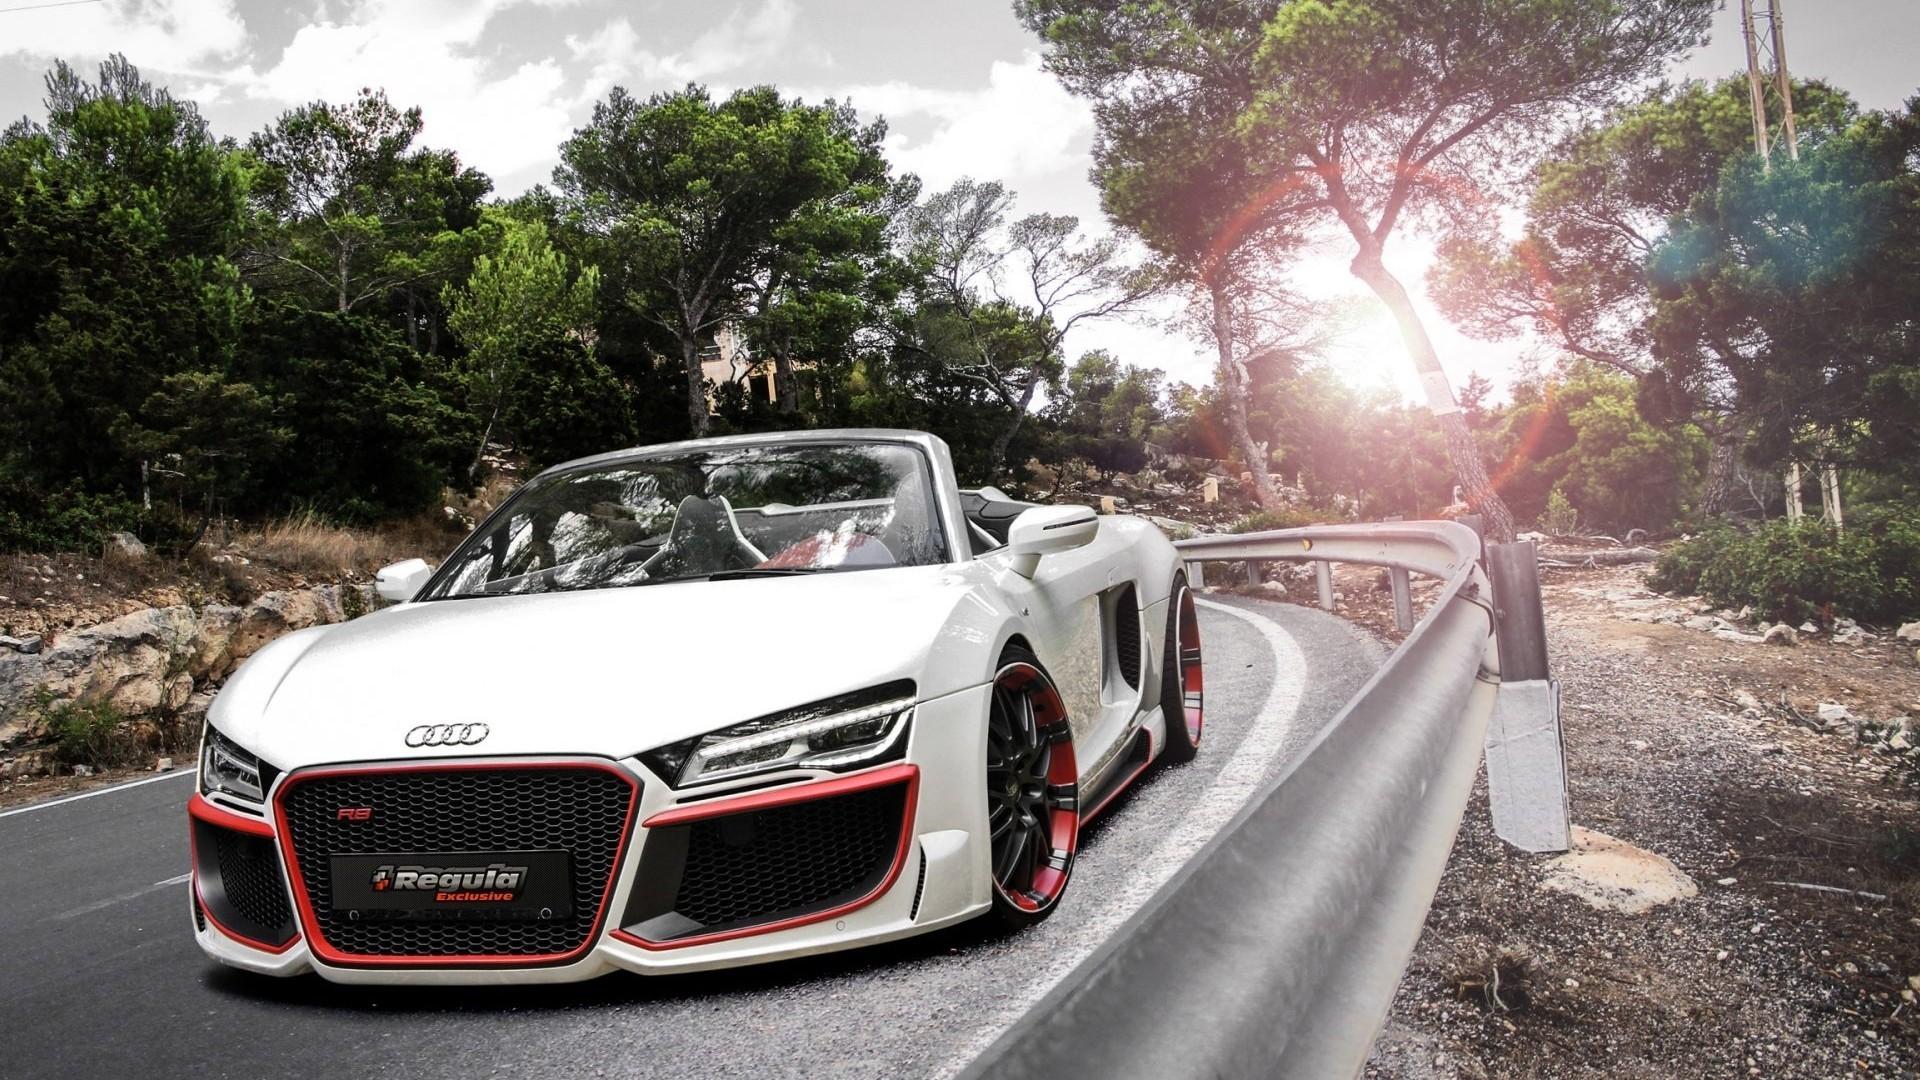 R8 Spyder Audi Car Wallpaper